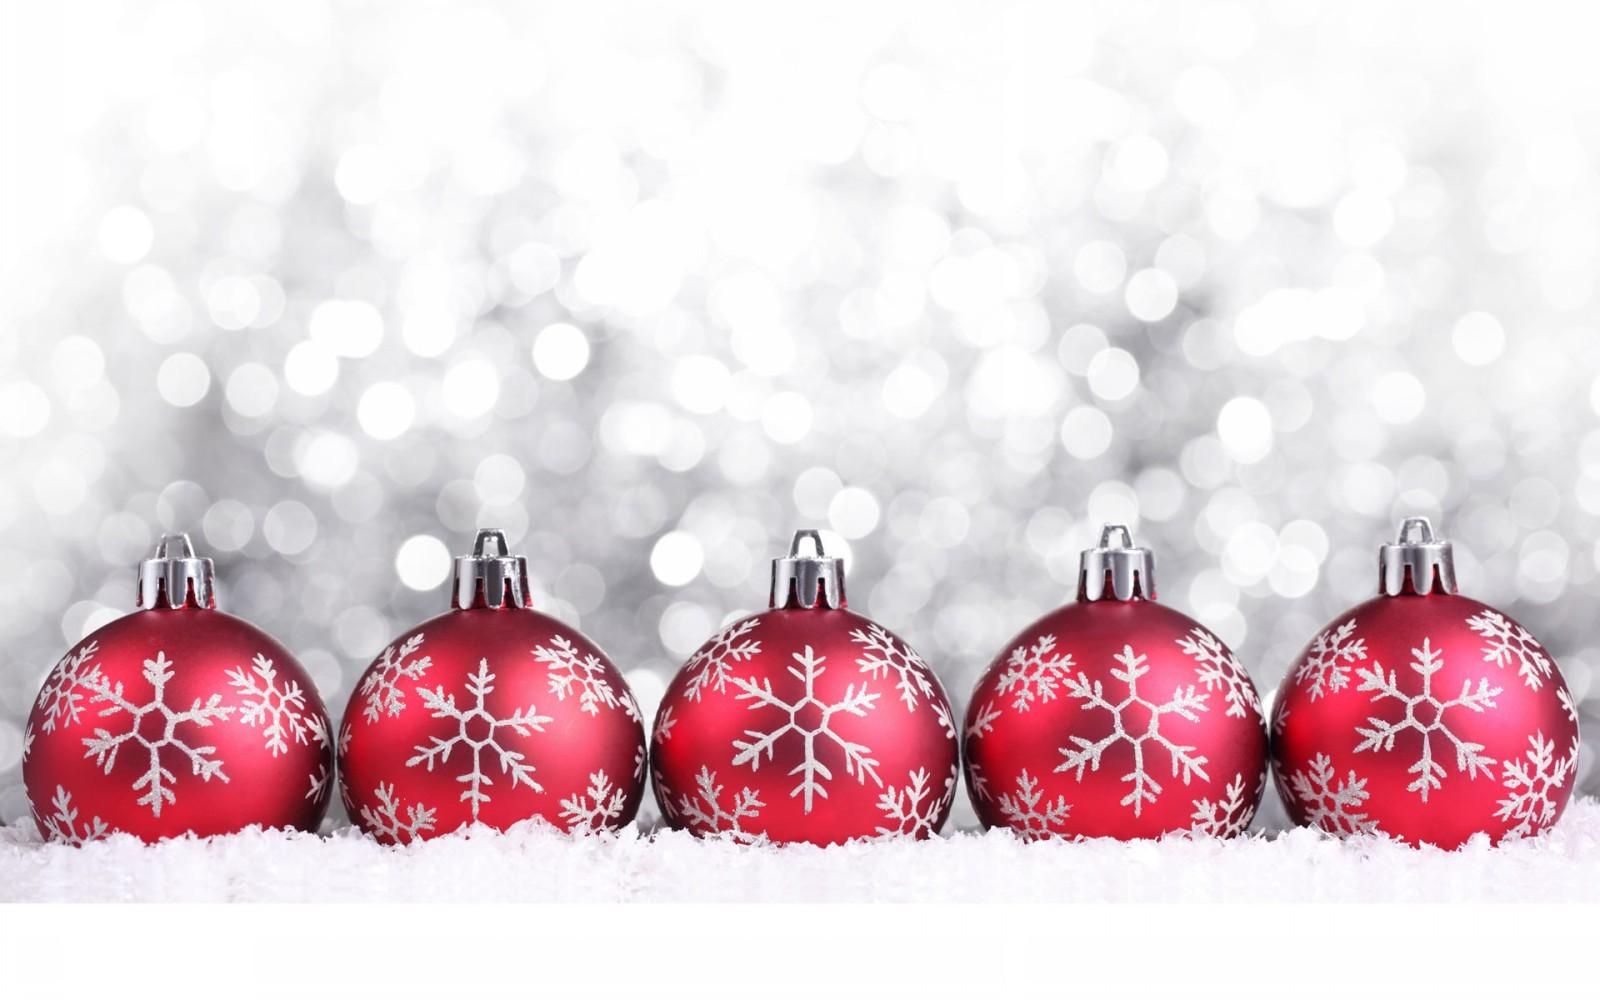 Christmas-Decorations-Snow-HD-Wallpaper